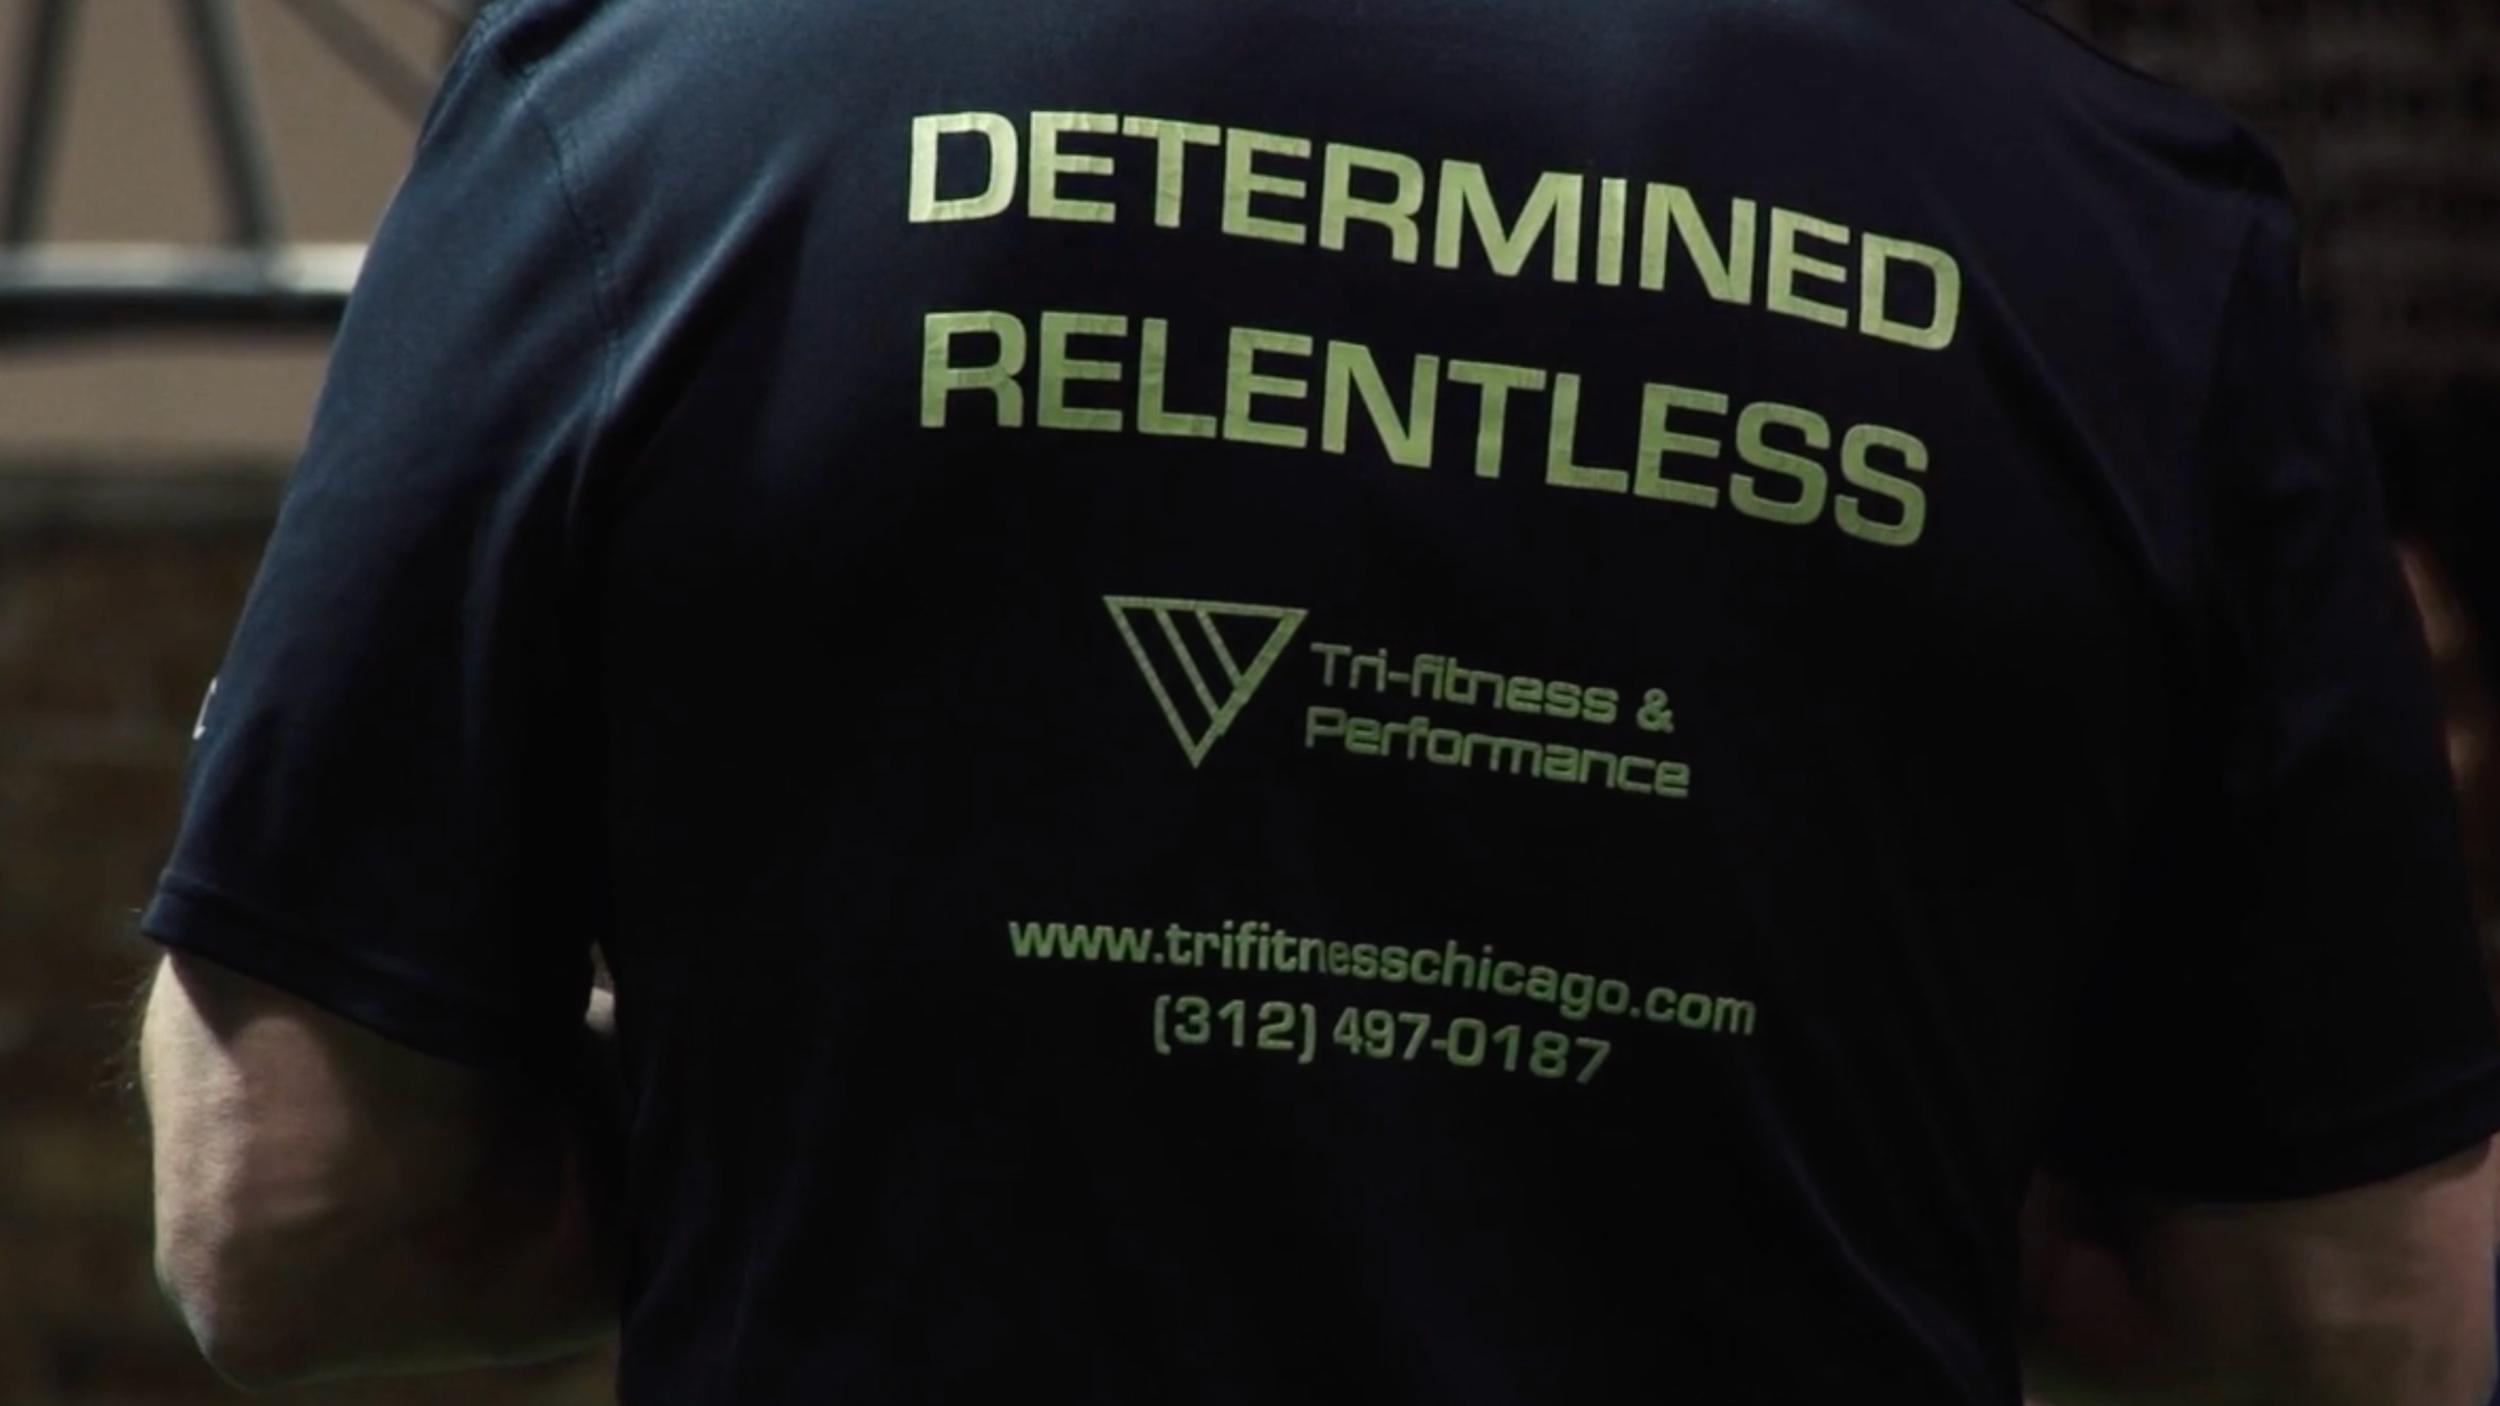 Trifitness & Performance Promotional Video